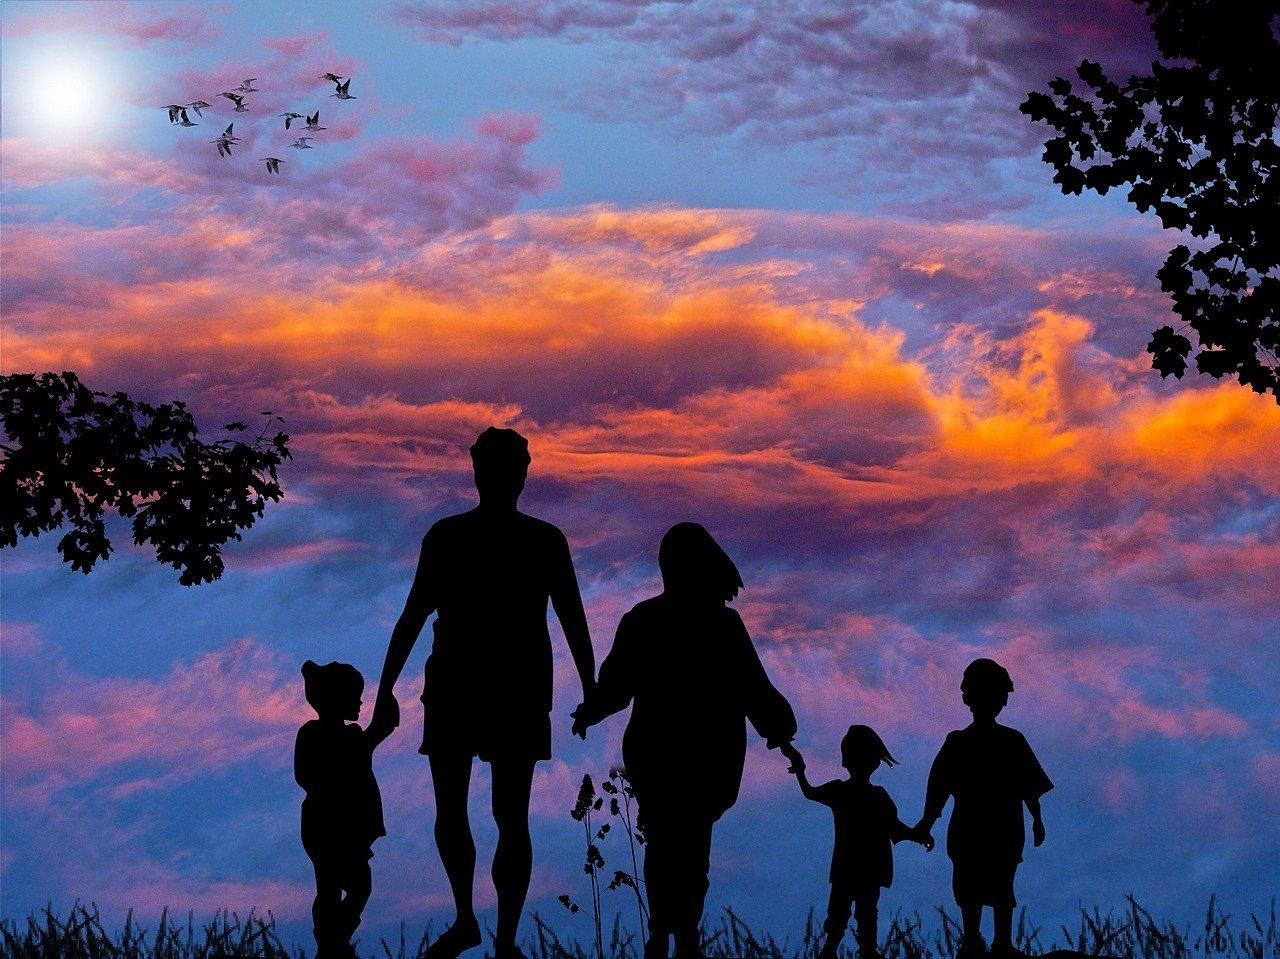 THU, OCT 29, 2020 - Six Week Positive Discipline for Parents